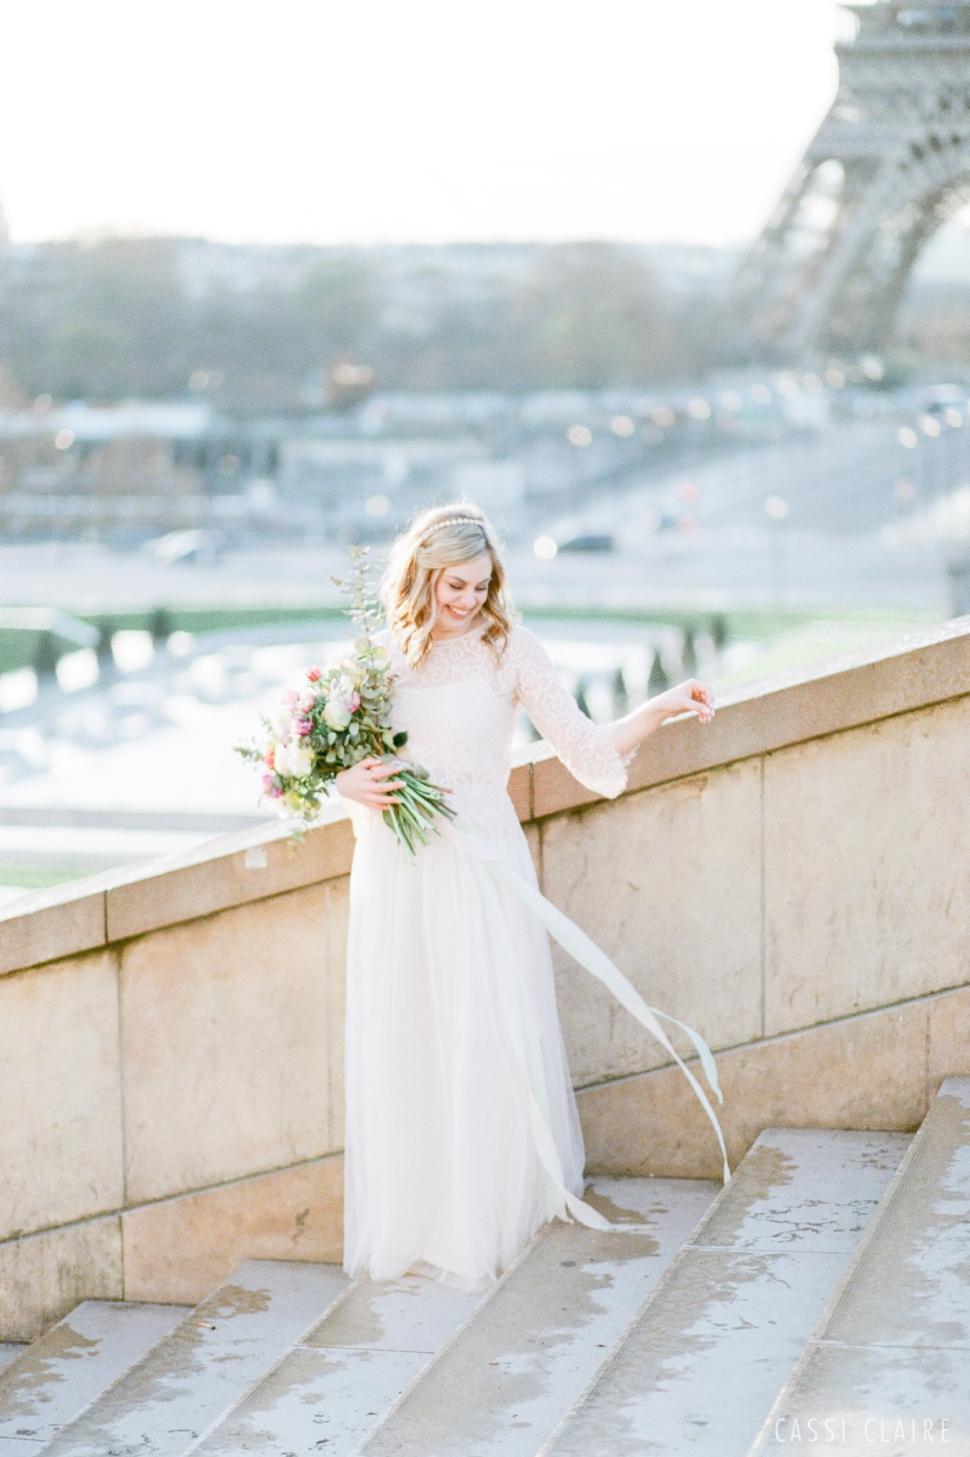 Paris-France-Wedding_CassiClaire_16.jpg